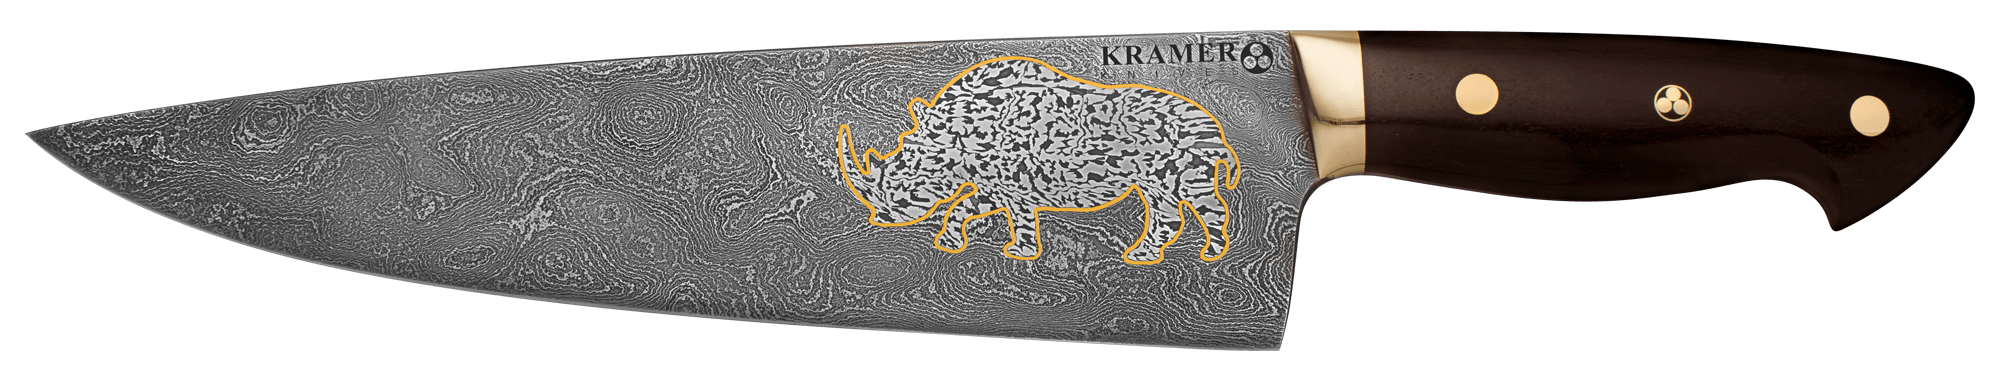 rhino-left-2-2000